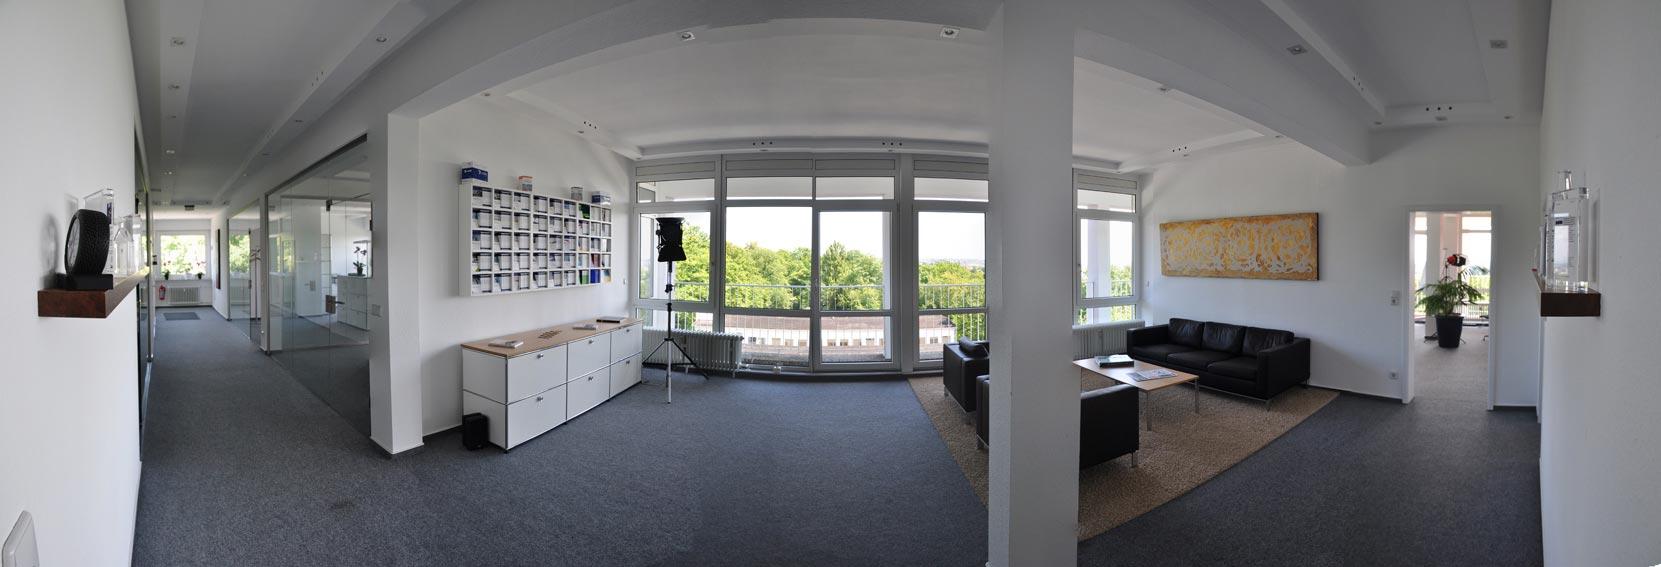 Räume cometis AG Flur Panorama